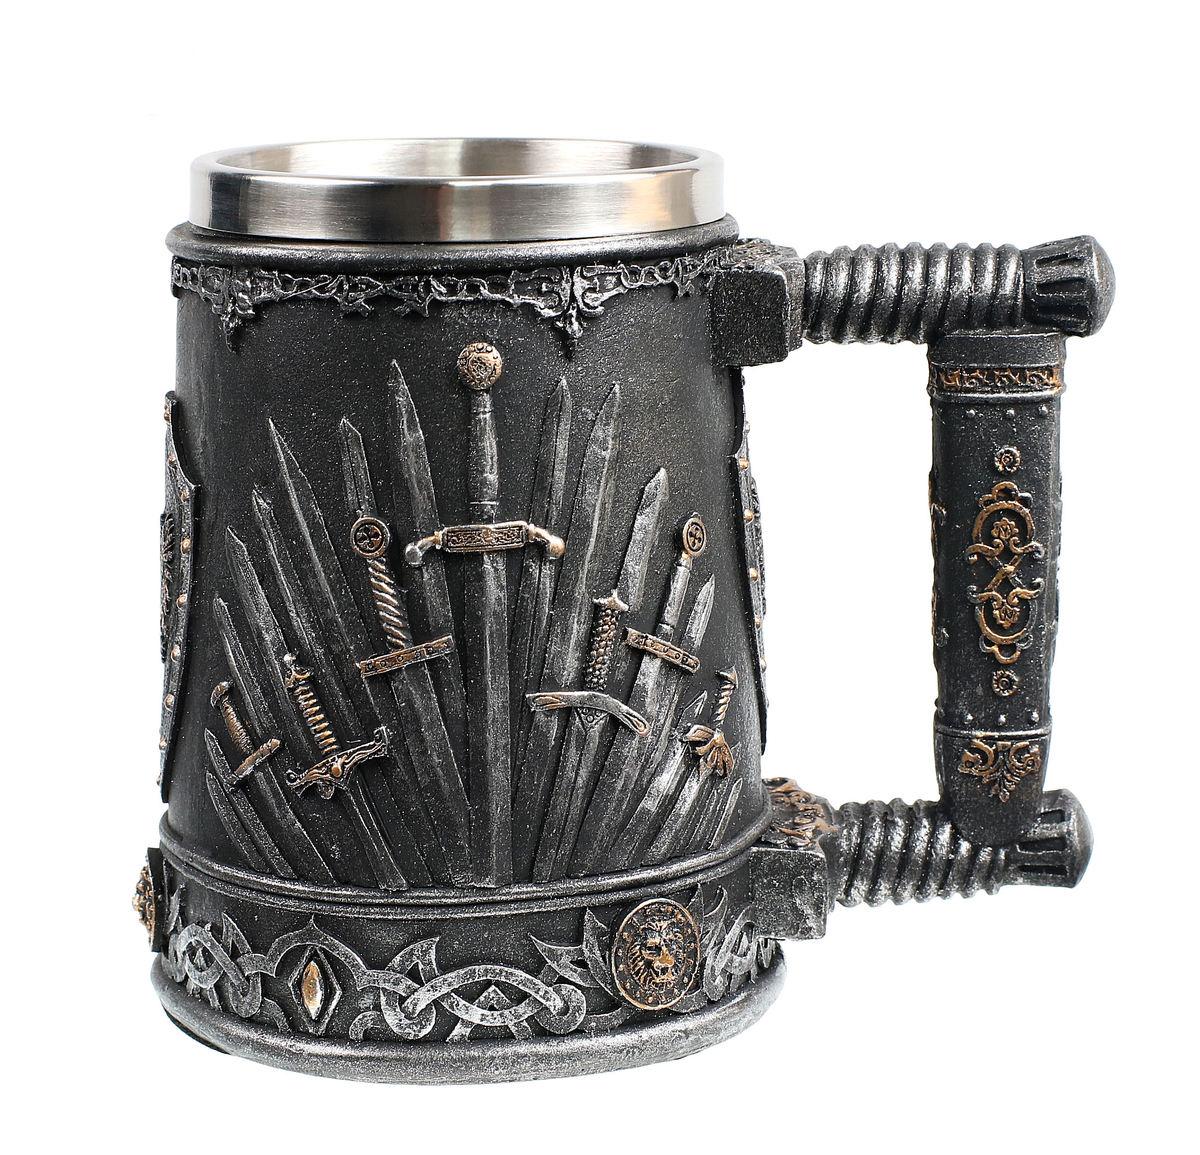 hrnček (korbel) Sword of the King - D4213M8